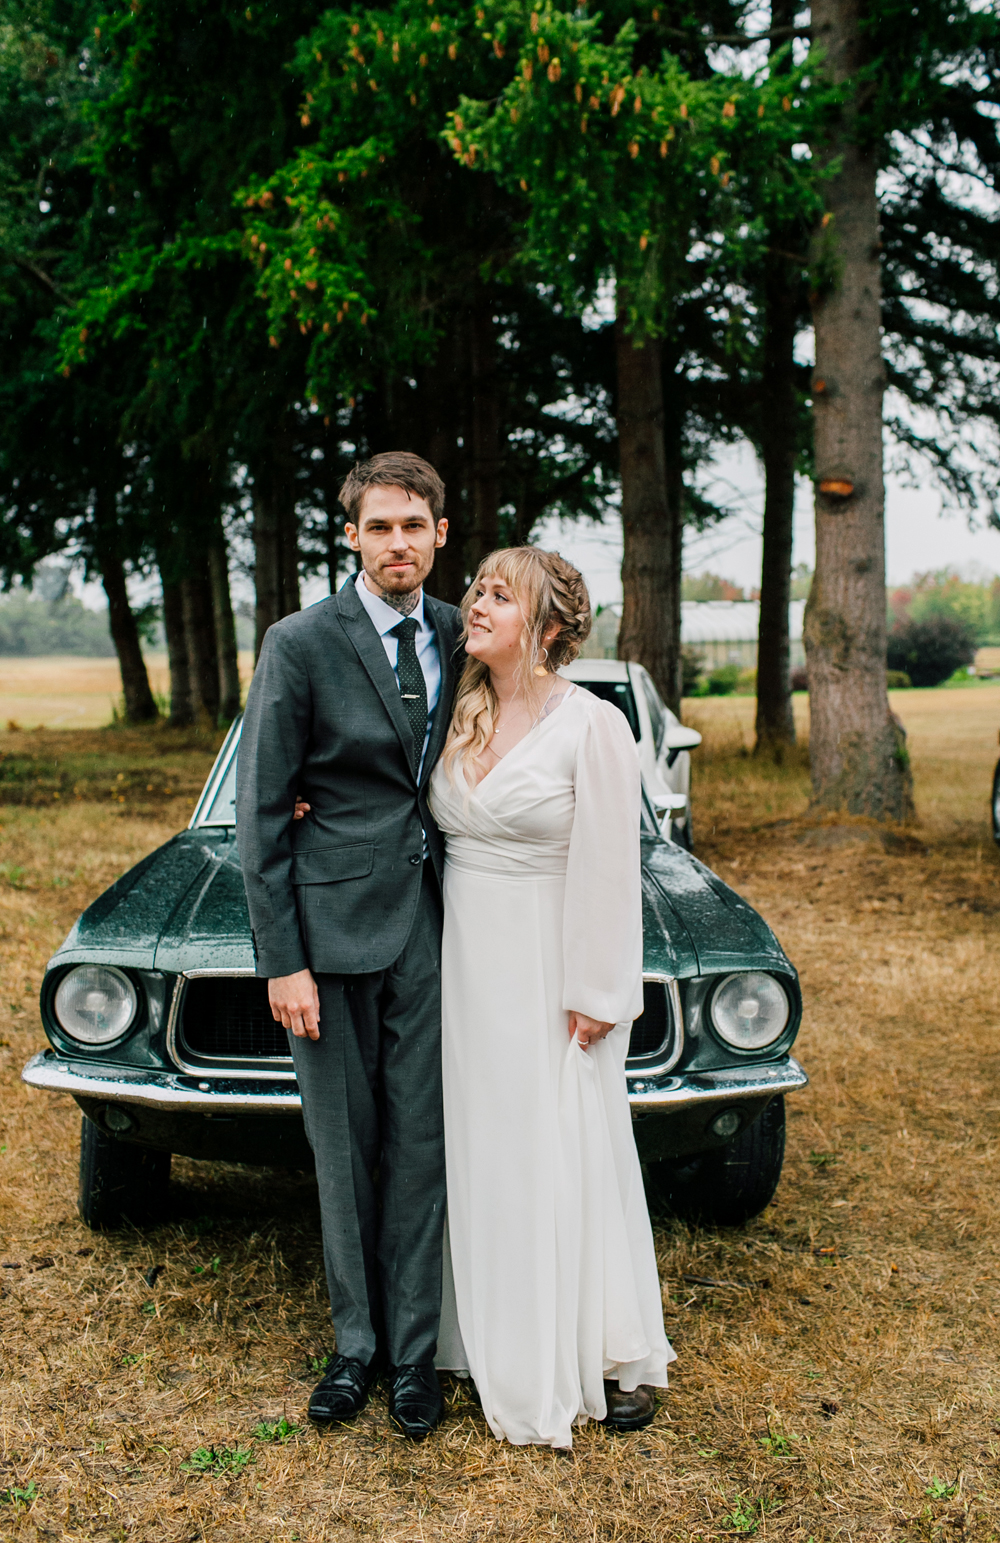 023-bellingham-wedding-photographer-hovander-park-ferndale-katheryn-moran-bre-mitch.jpg